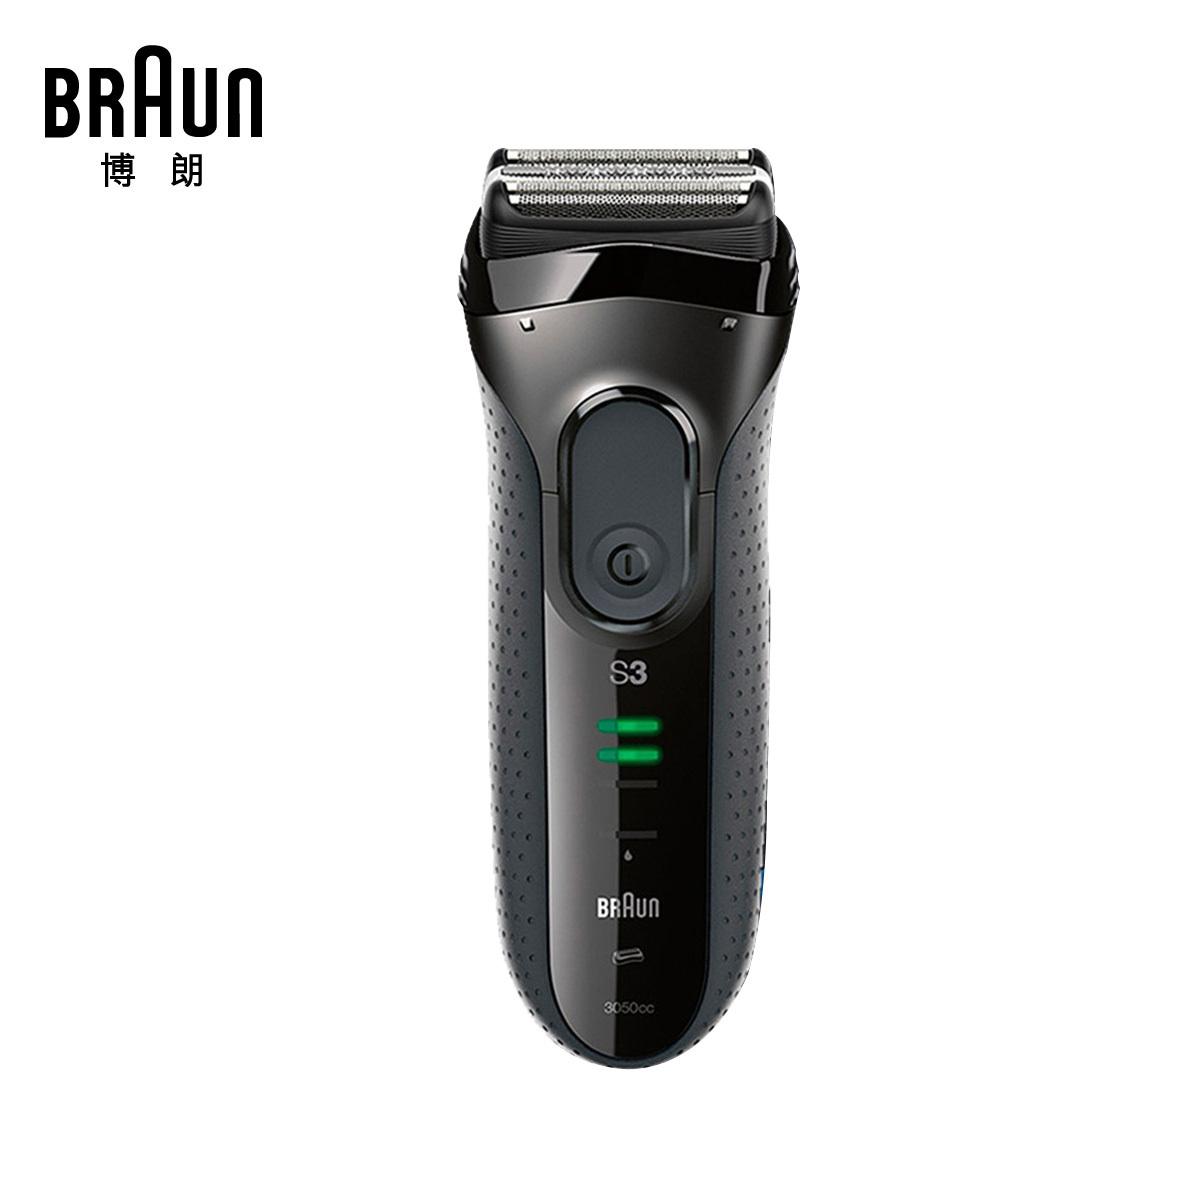 Braun/博朗 5412 电剃须刀怎么样,质量如何,好用吗